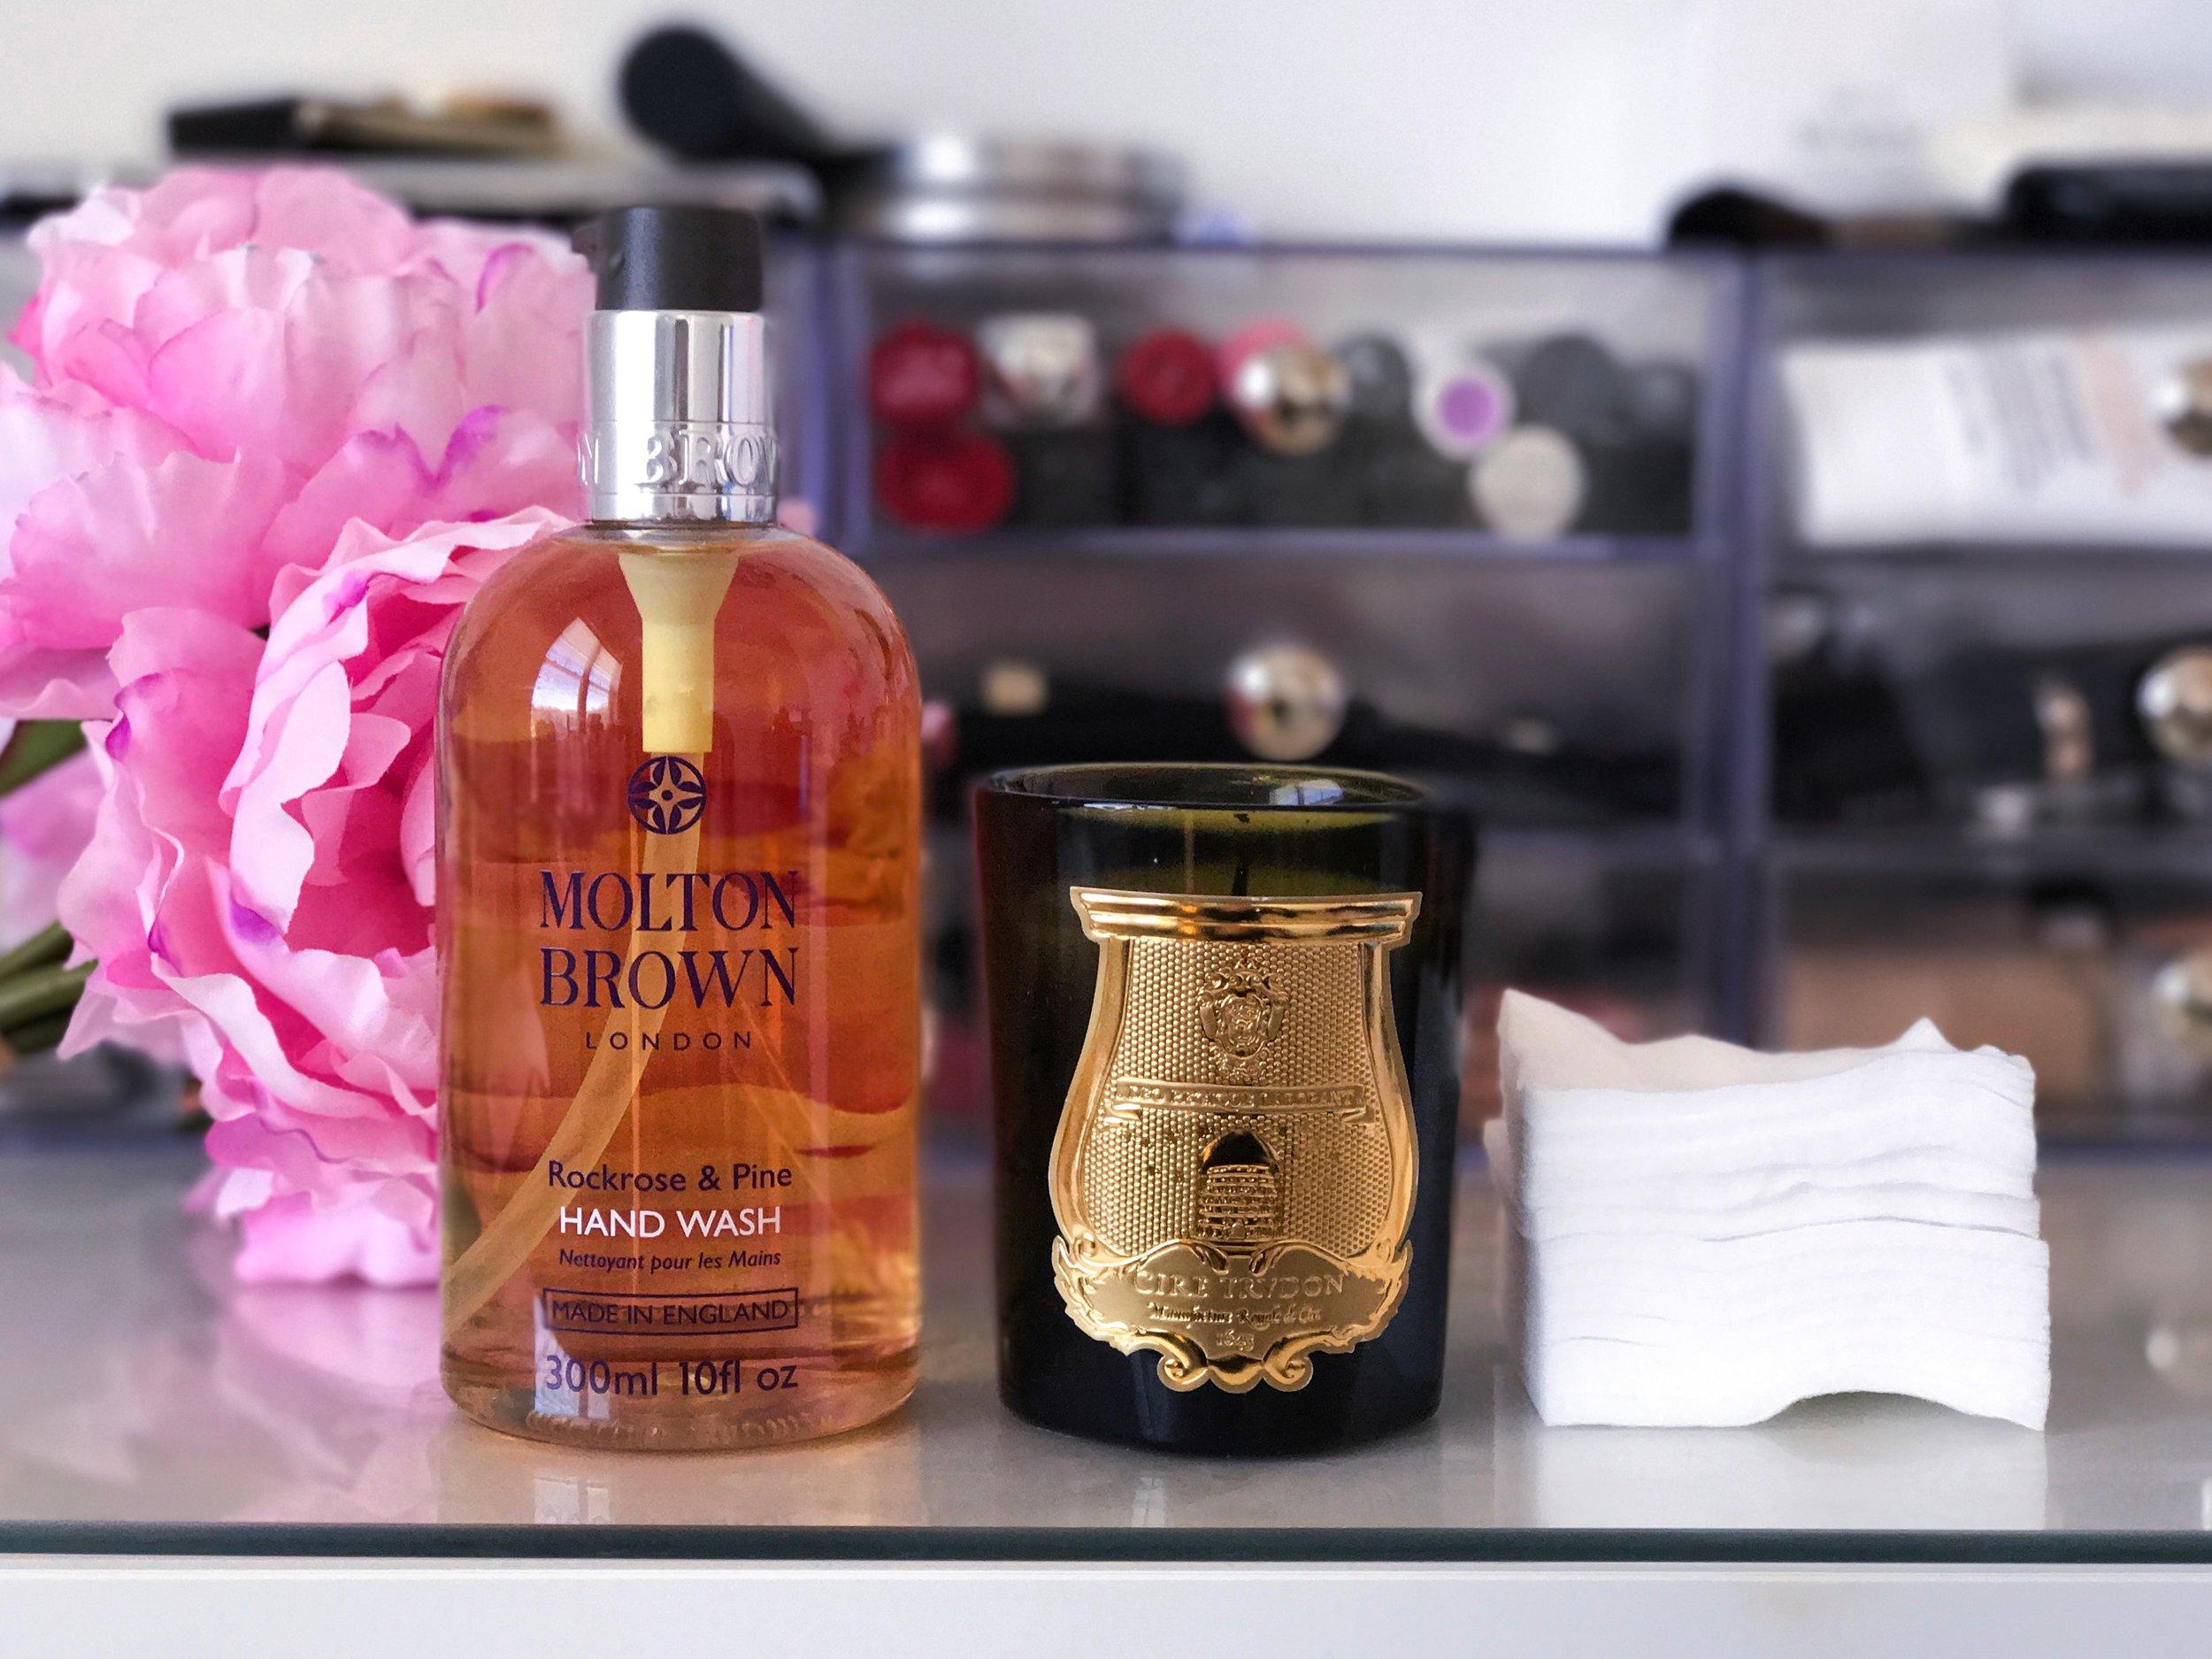 Molton Brown Rockrose & Pine Hand Wash, Cire Trudon Dada Candle, Shiseido Facial Cottons